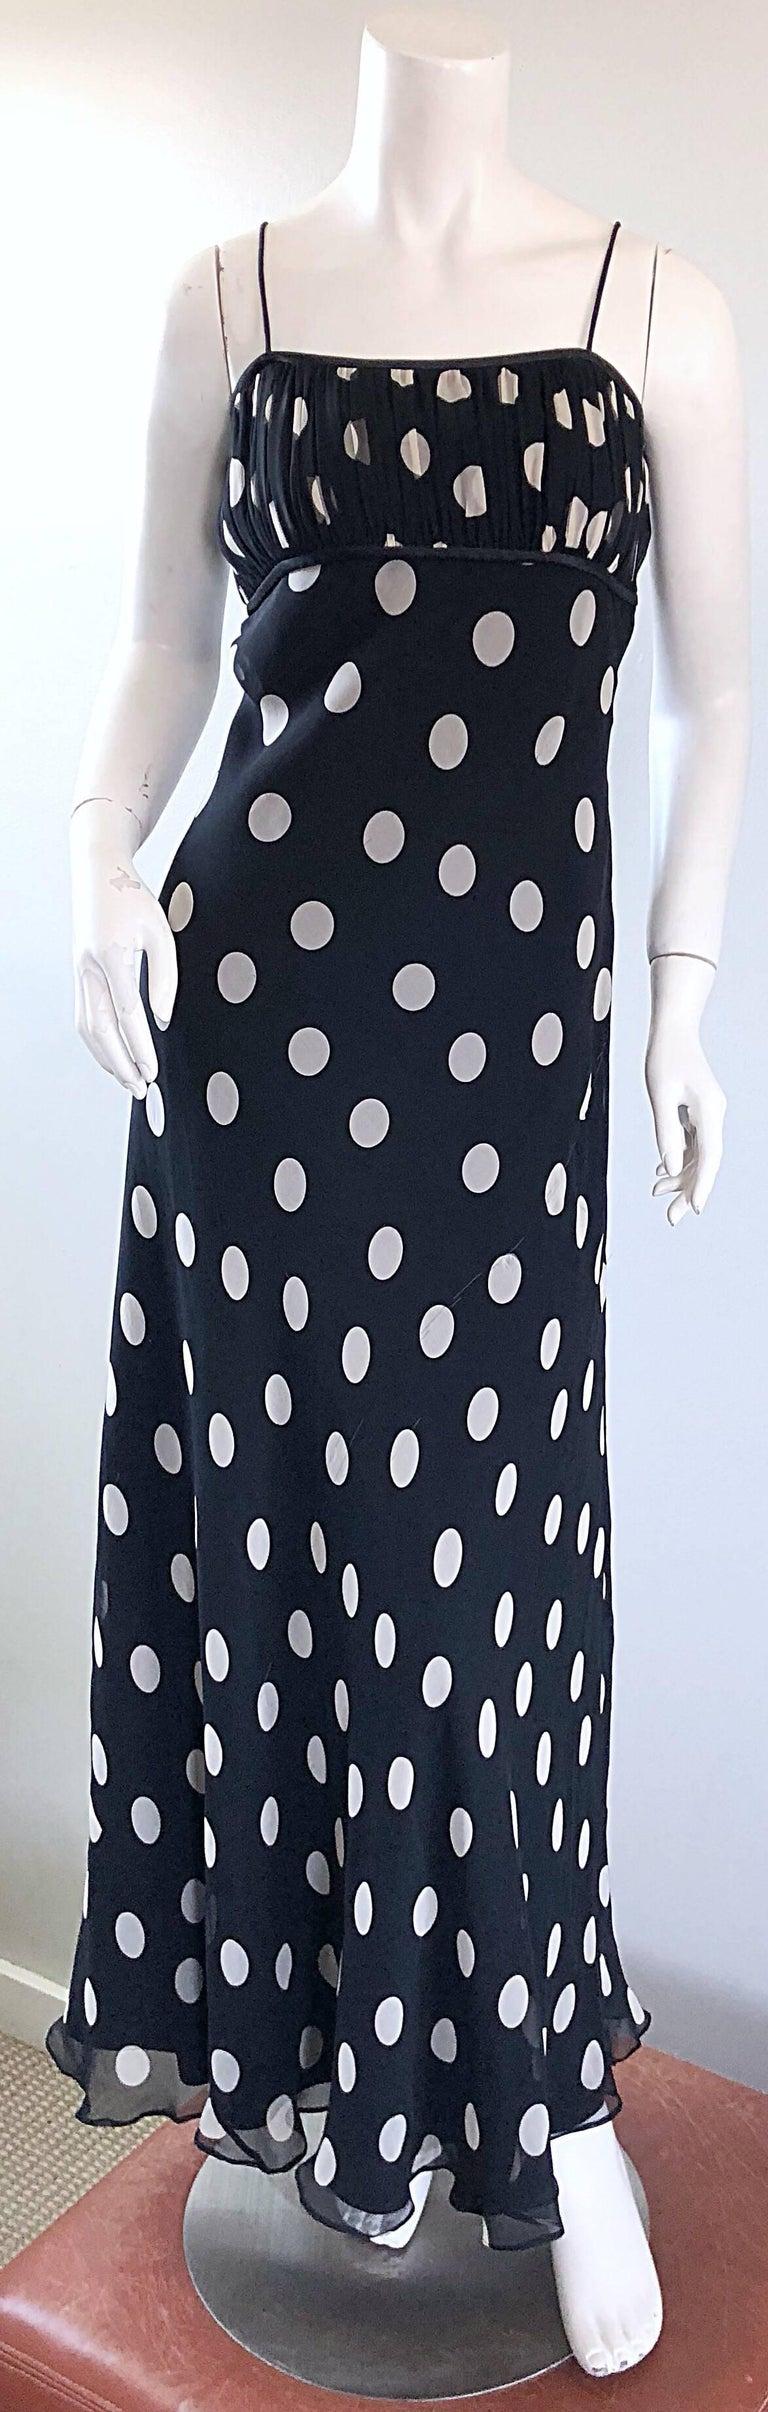 1990s Abriele Melano Black and White Polka Dot Silk Chiffon Maxi Dress 90s Gown For Sale 8